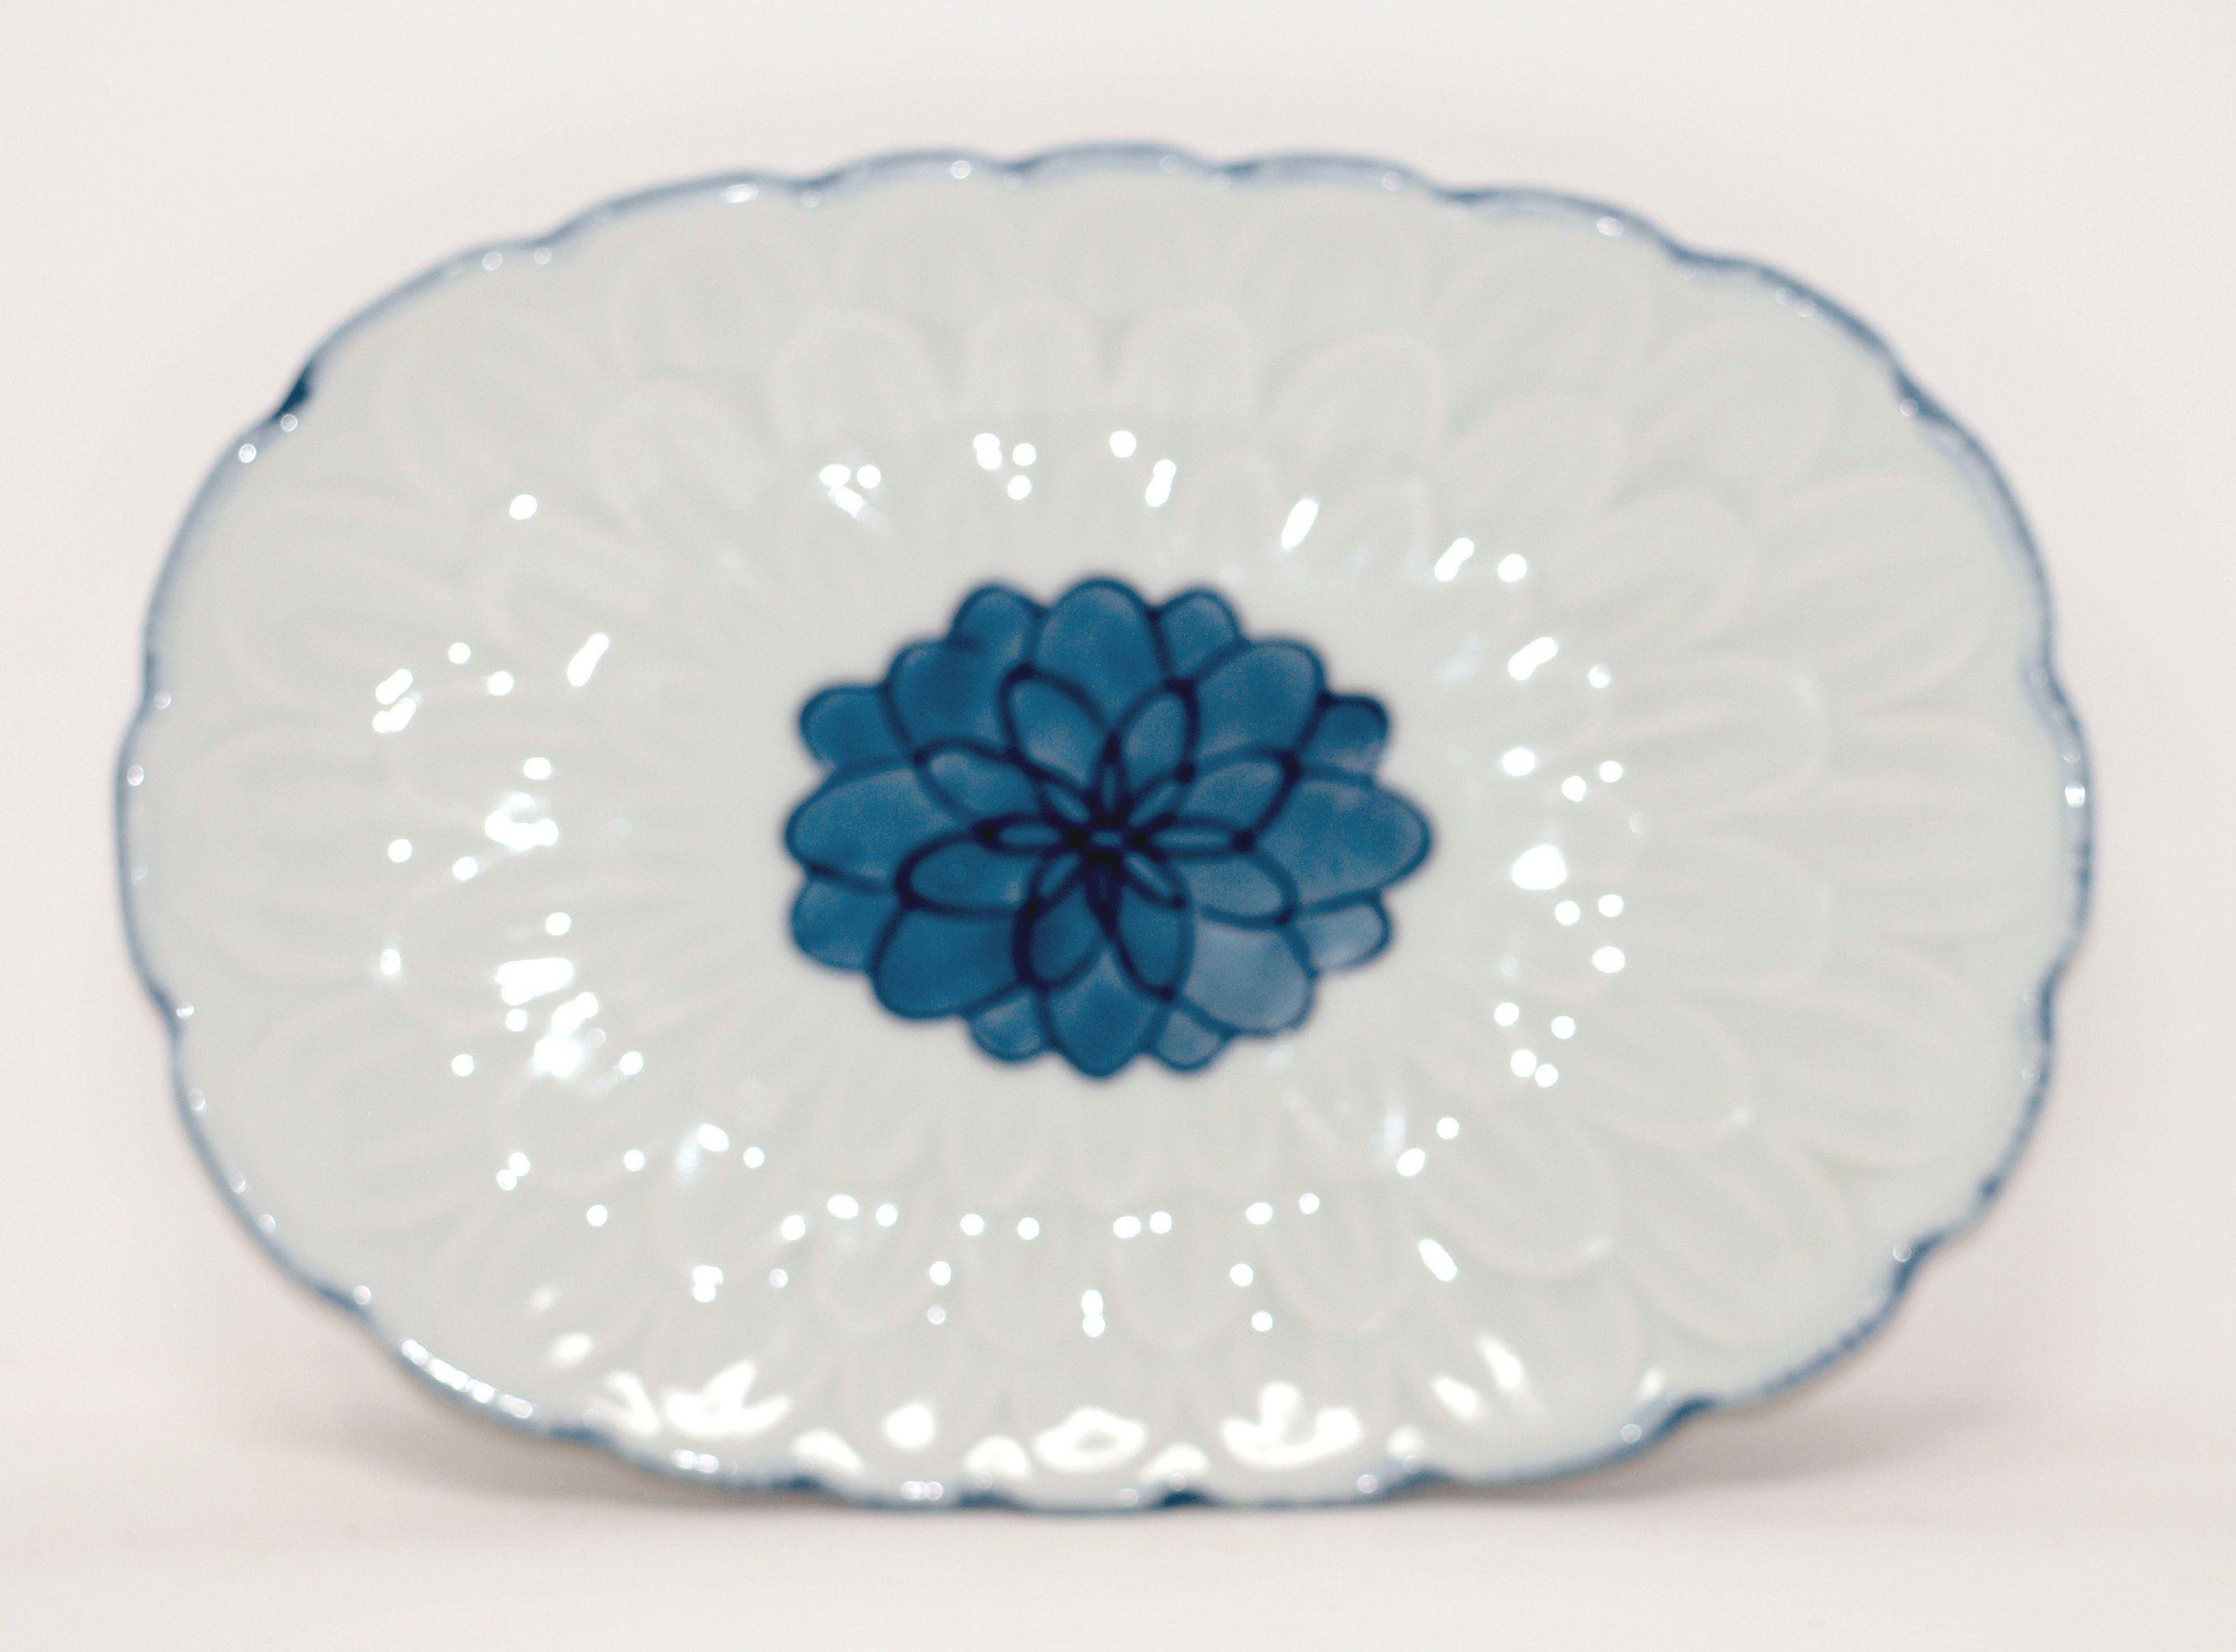 Vintage Blue & White Asian Platter, Oriental, Japanese, Dish ware, dish, Shabby Chic, Cottage Style, Farm House, Rustic,Romantic decor #dishware